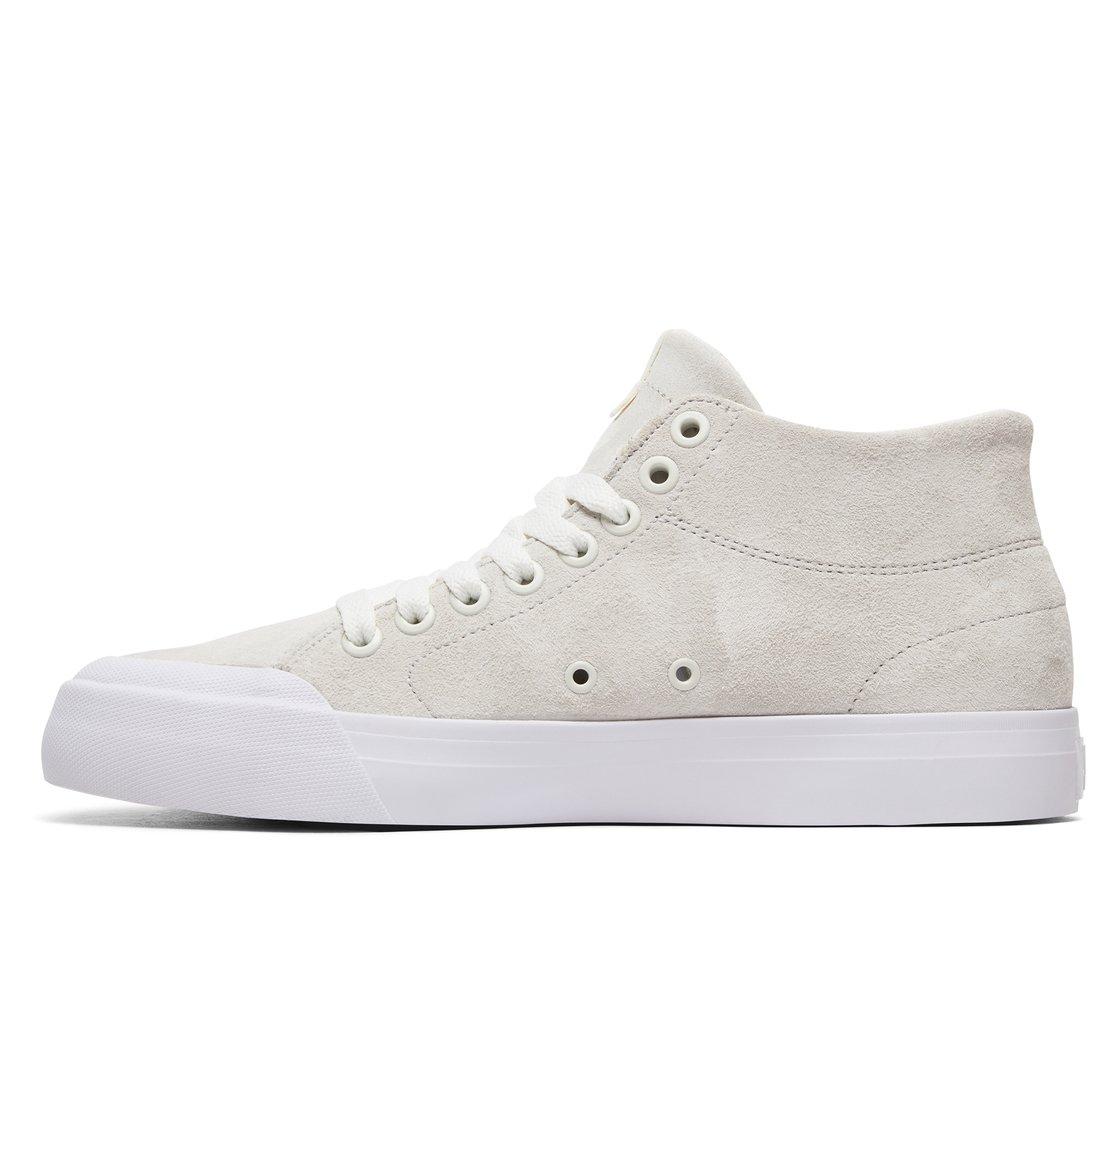 DC Shoes™ Women s Evan Hi Zero High-Top Leather Shoes ADJS300225  4c0dbfb13a36